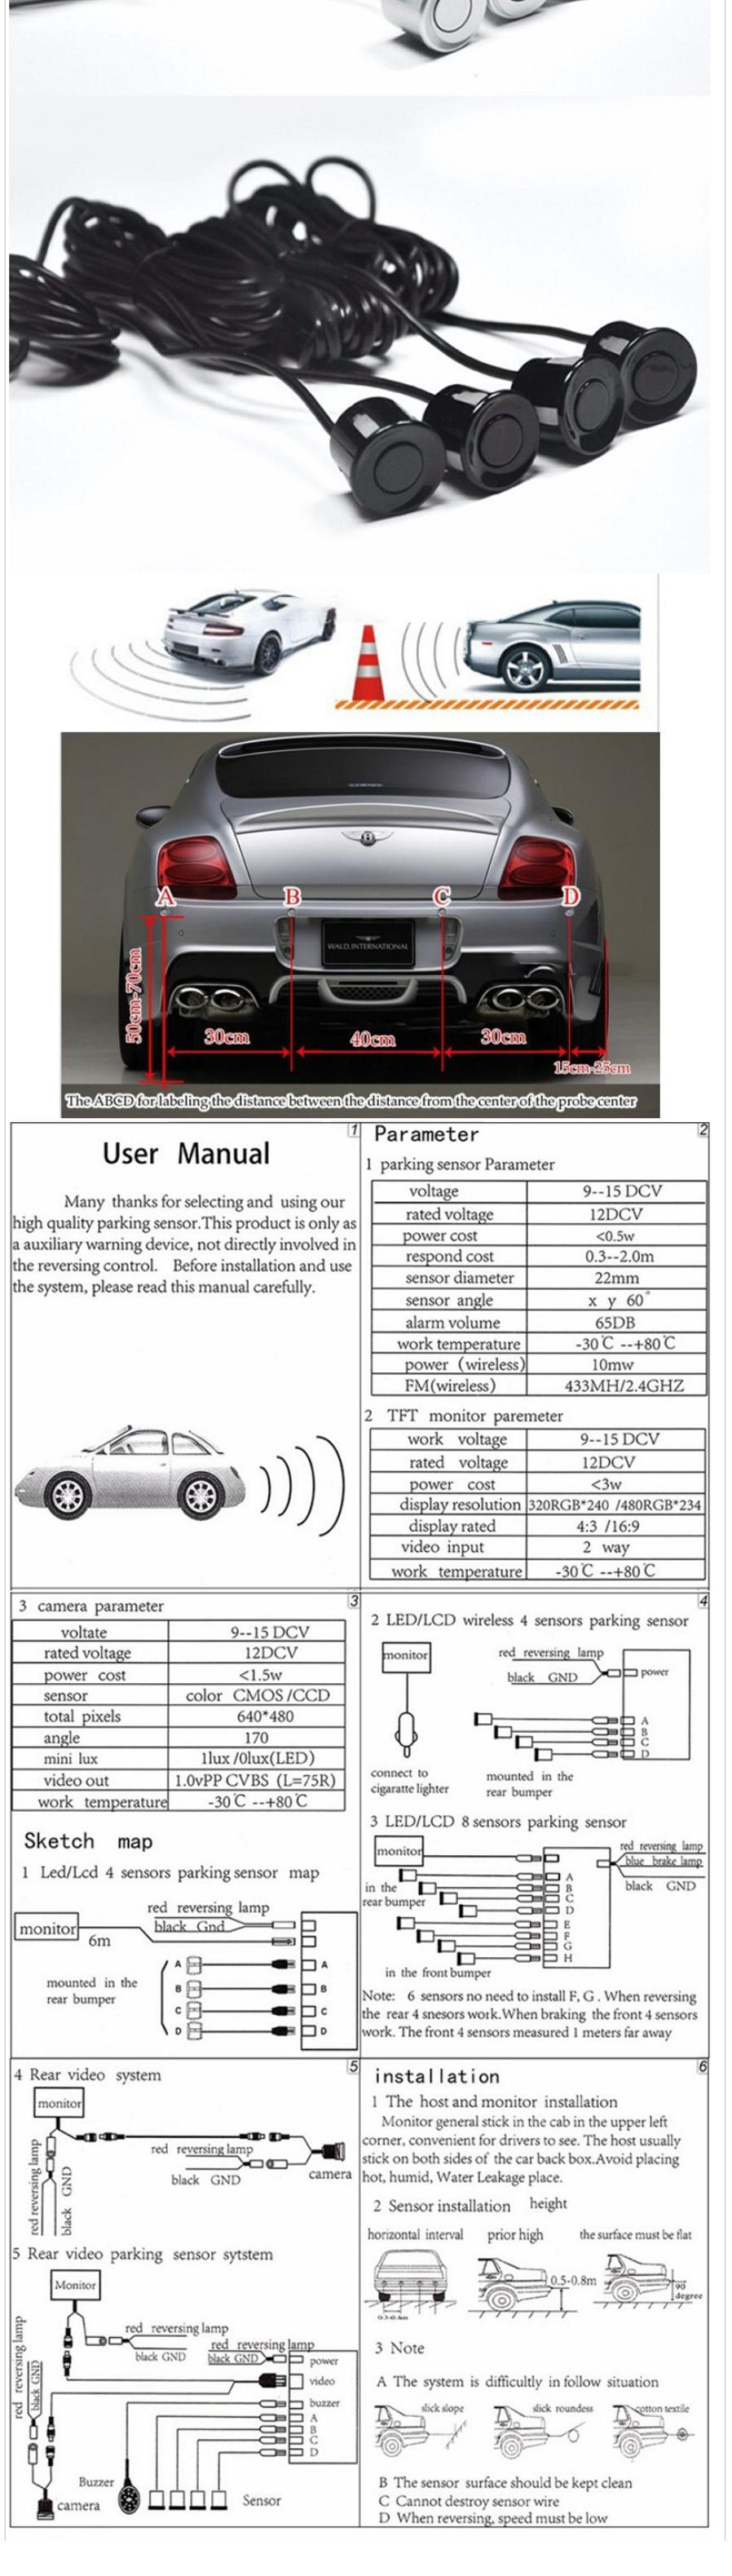 Dual Core CPU Video System 6 Car Parking Sensors, Reverse Backup Radar, 6  Alarm Beep Show Distance On Display Sensor Black